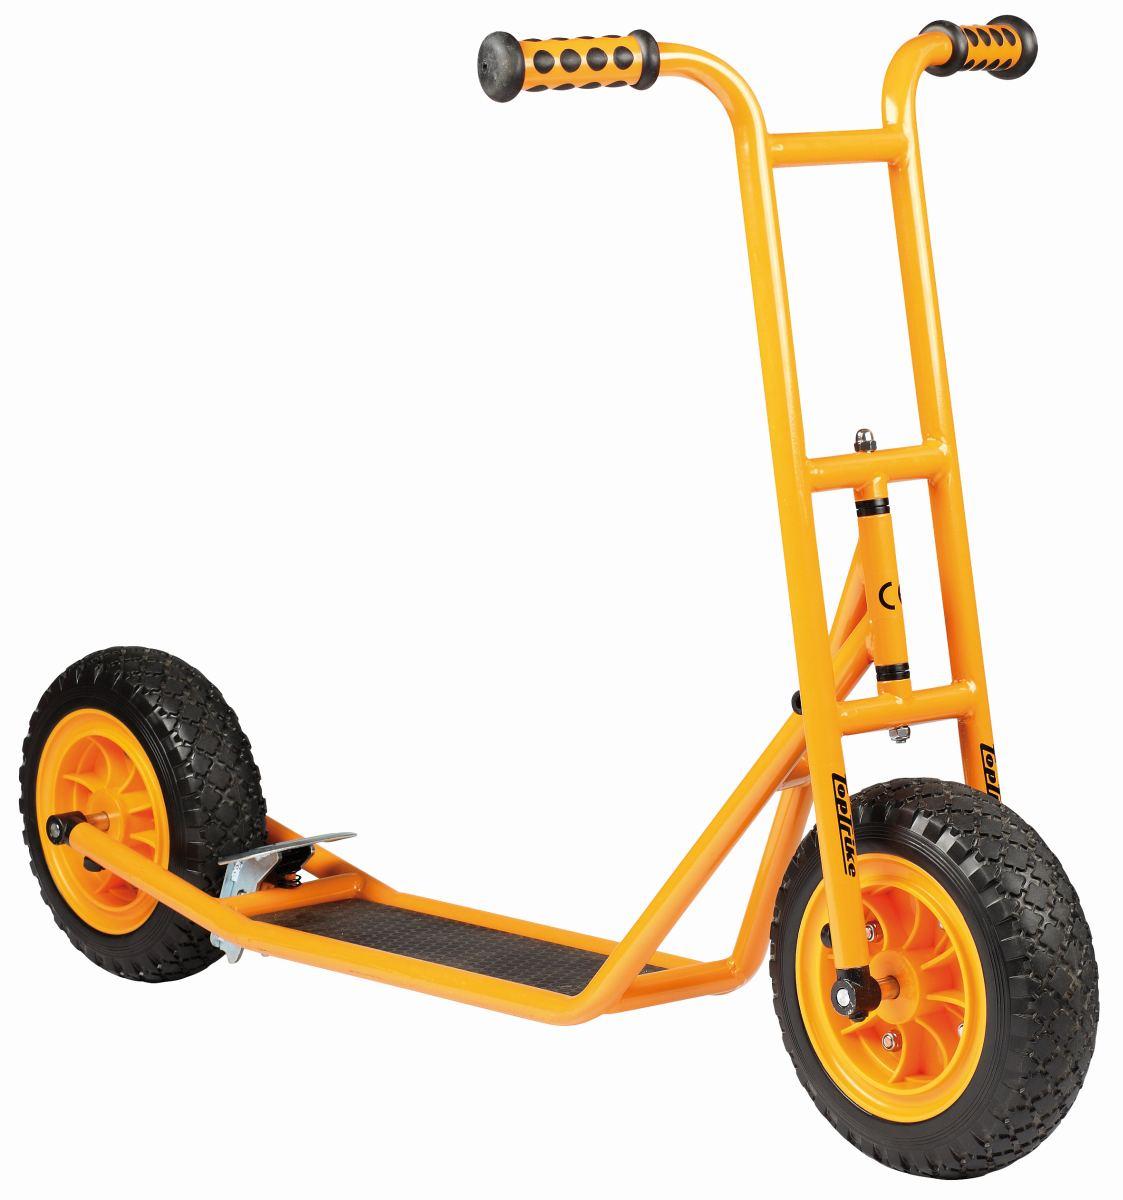 roller scooter gro lauflernrad kita fahrzeug outdoor fahrzeug 64010 holz spielzeug peitz. Black Bedroom Furniture Sets. Home Design Ideas